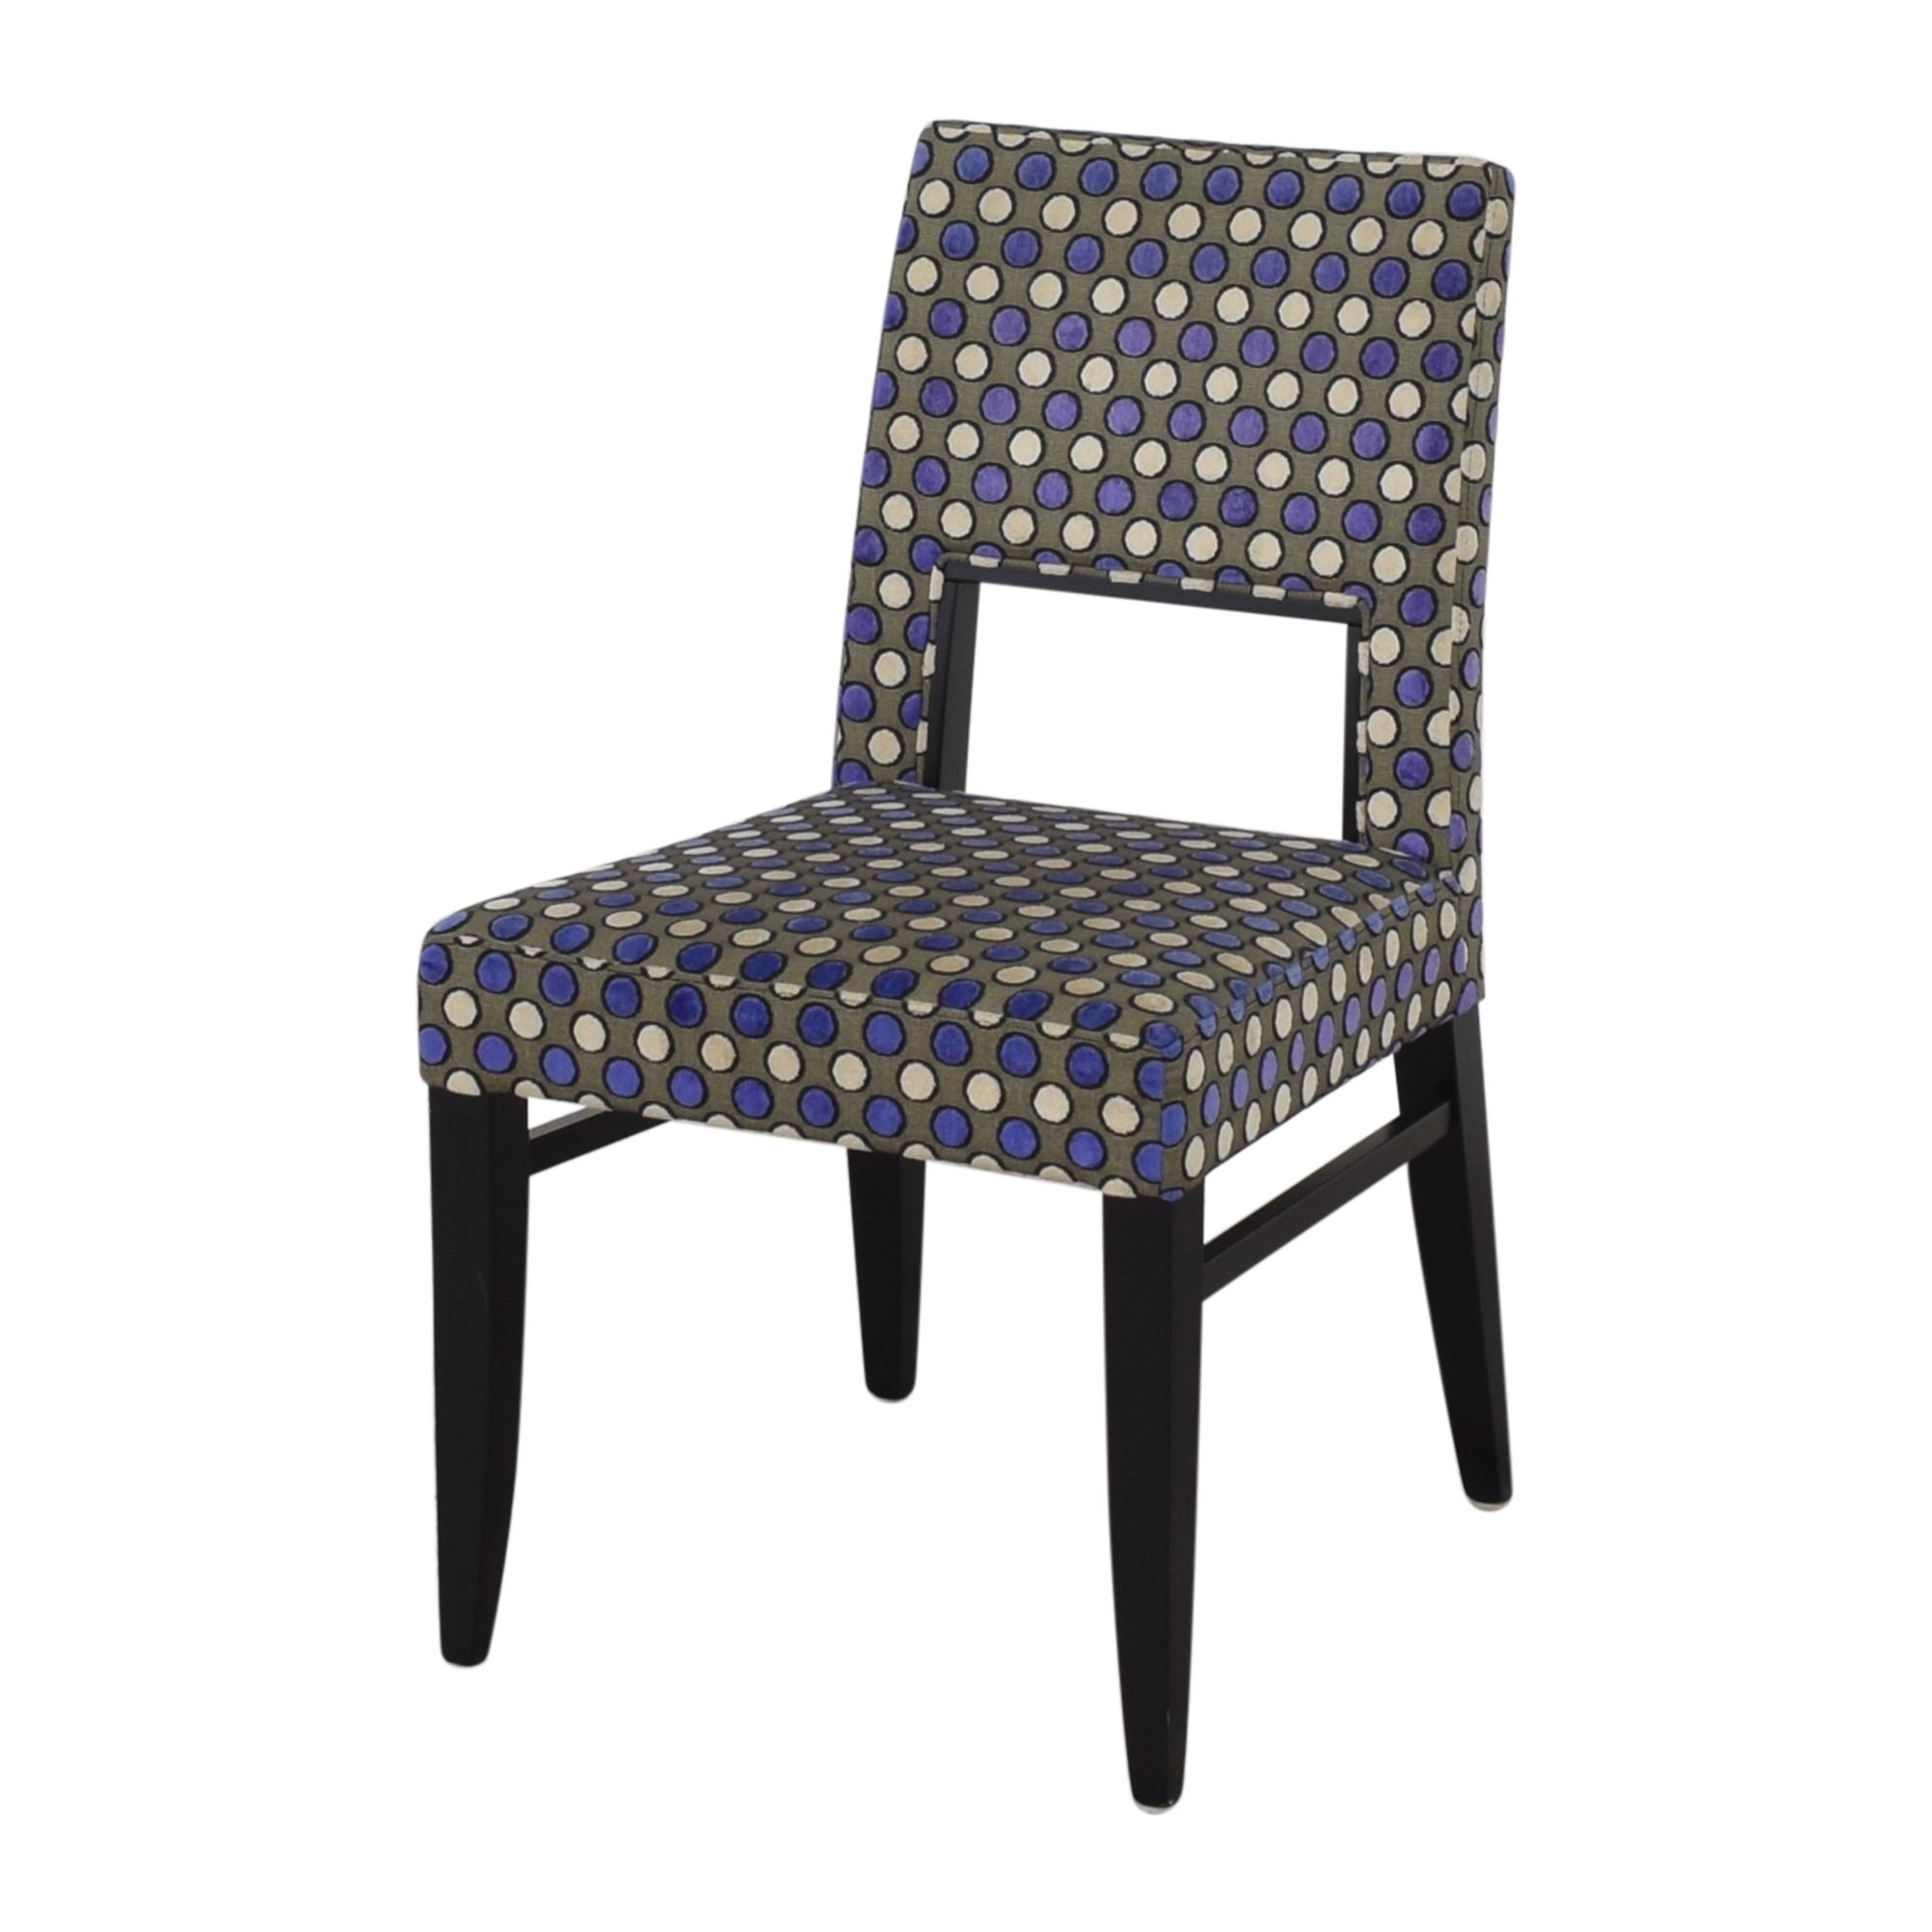 Pietro Costantini Pietro Costantini Blues Dining Chairs Chairs